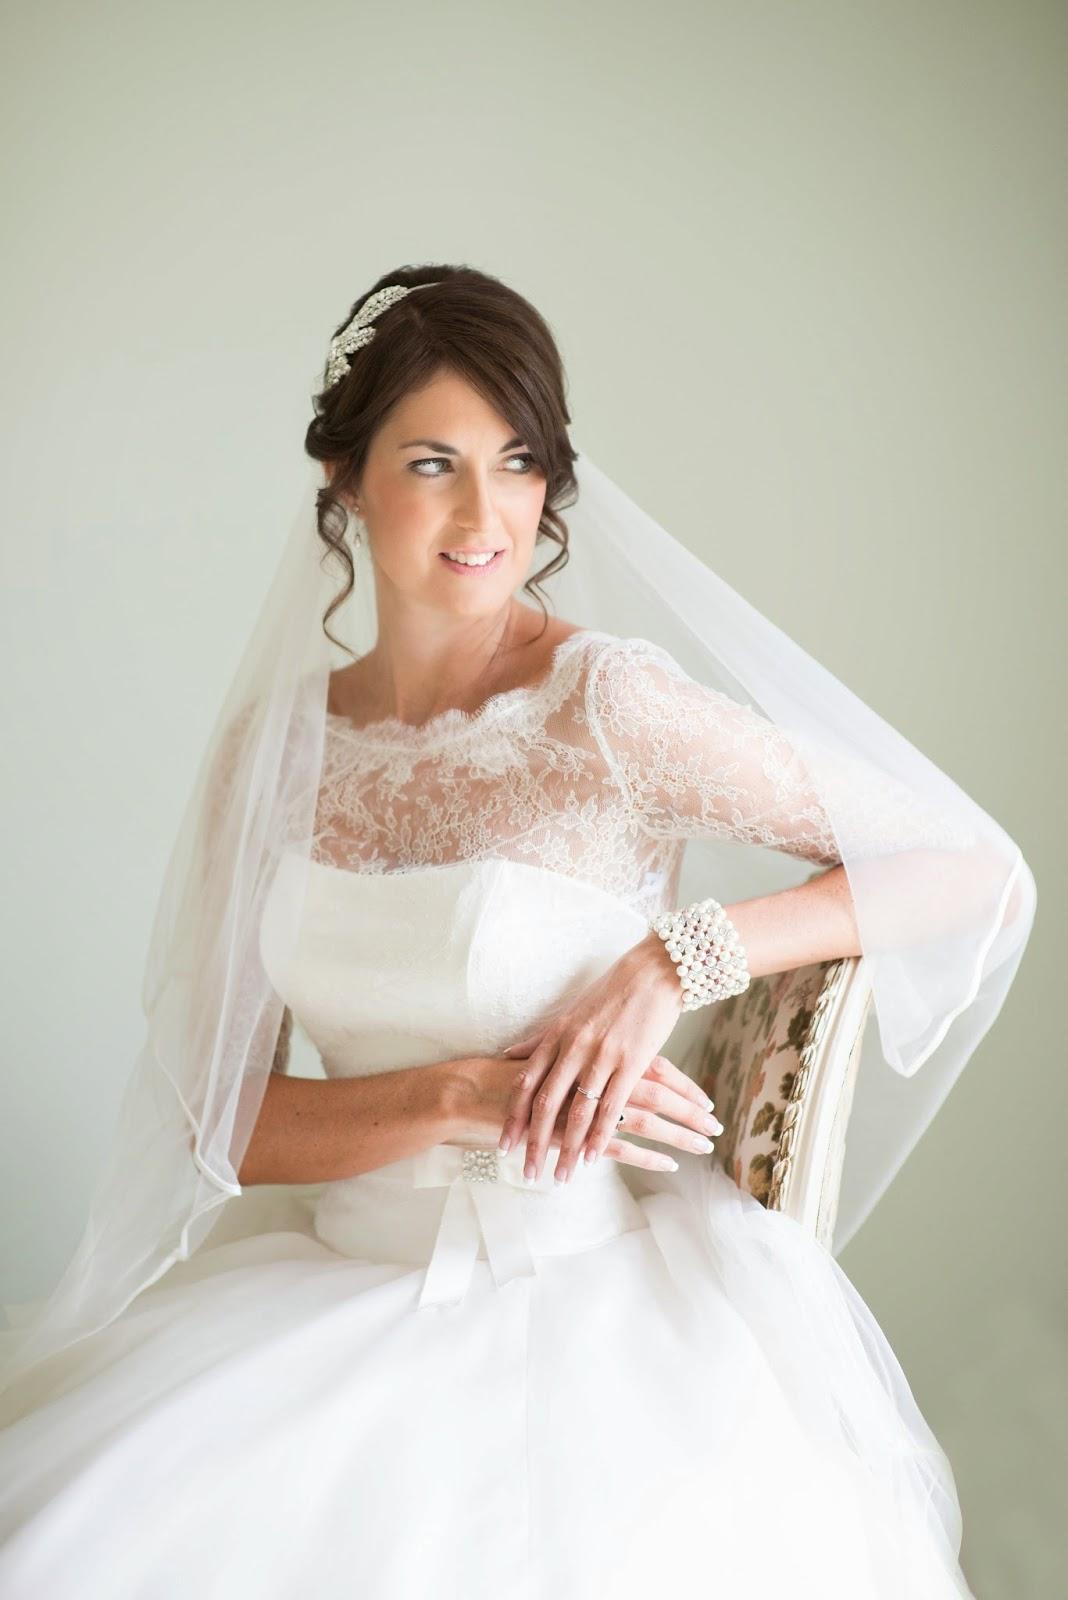 Wedding hair accessories gloucestershire - Wedding Hairstyling For Birtsmorton Court Worcestershire